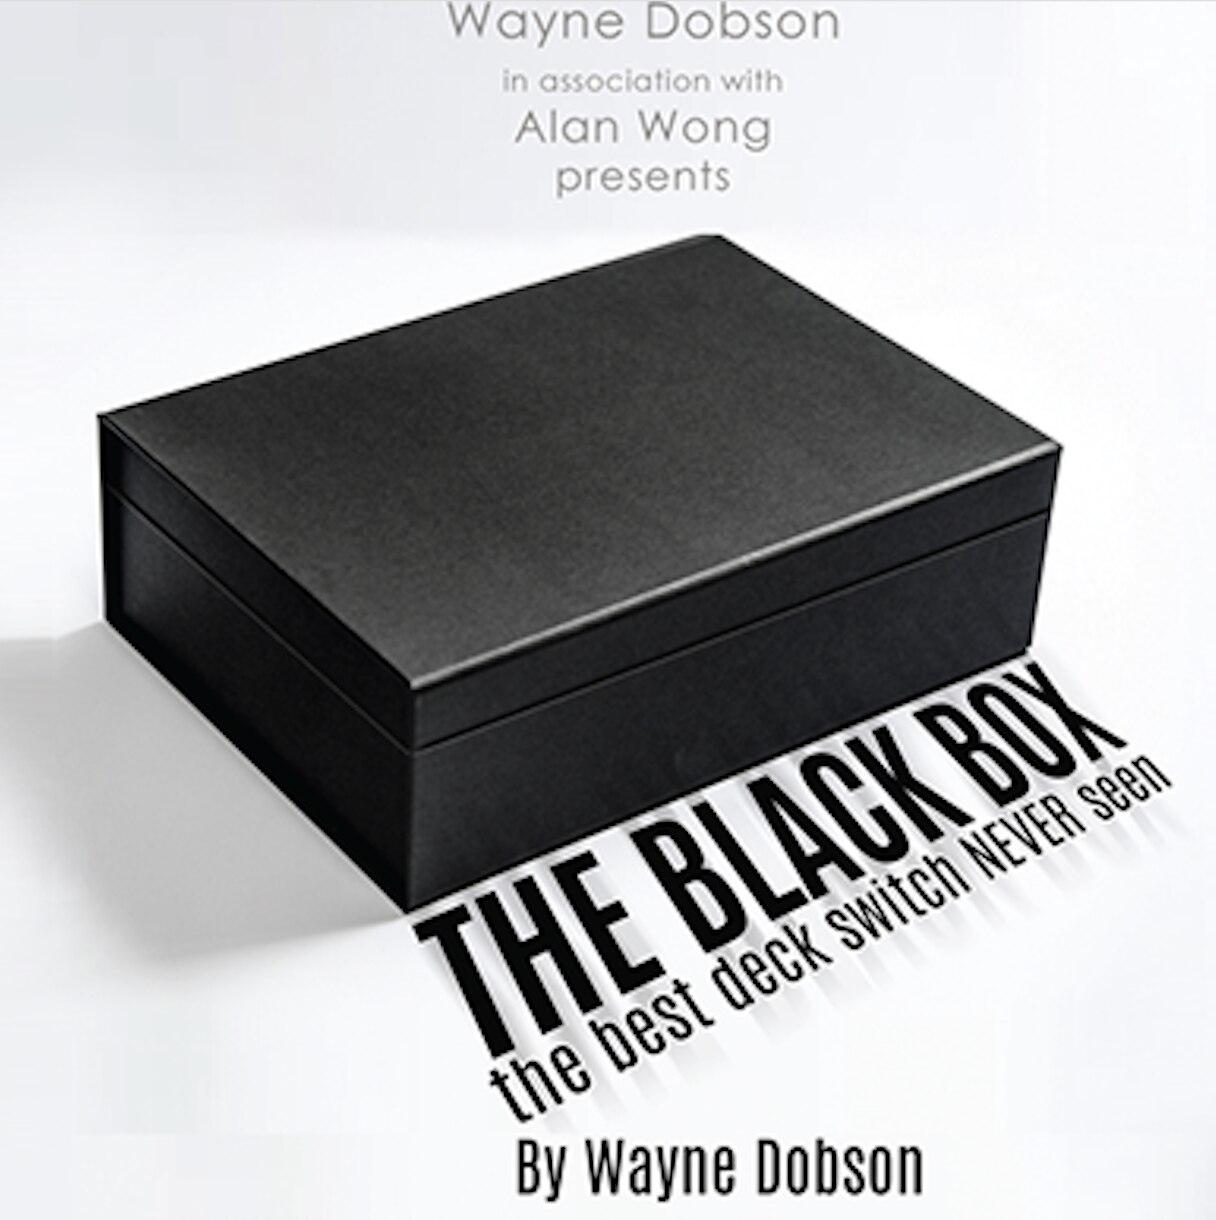 La caja negra (truco e instrucciones en línea) trucos de Magia divertidos Close up Magia ilusiones mentalismo trucos magos